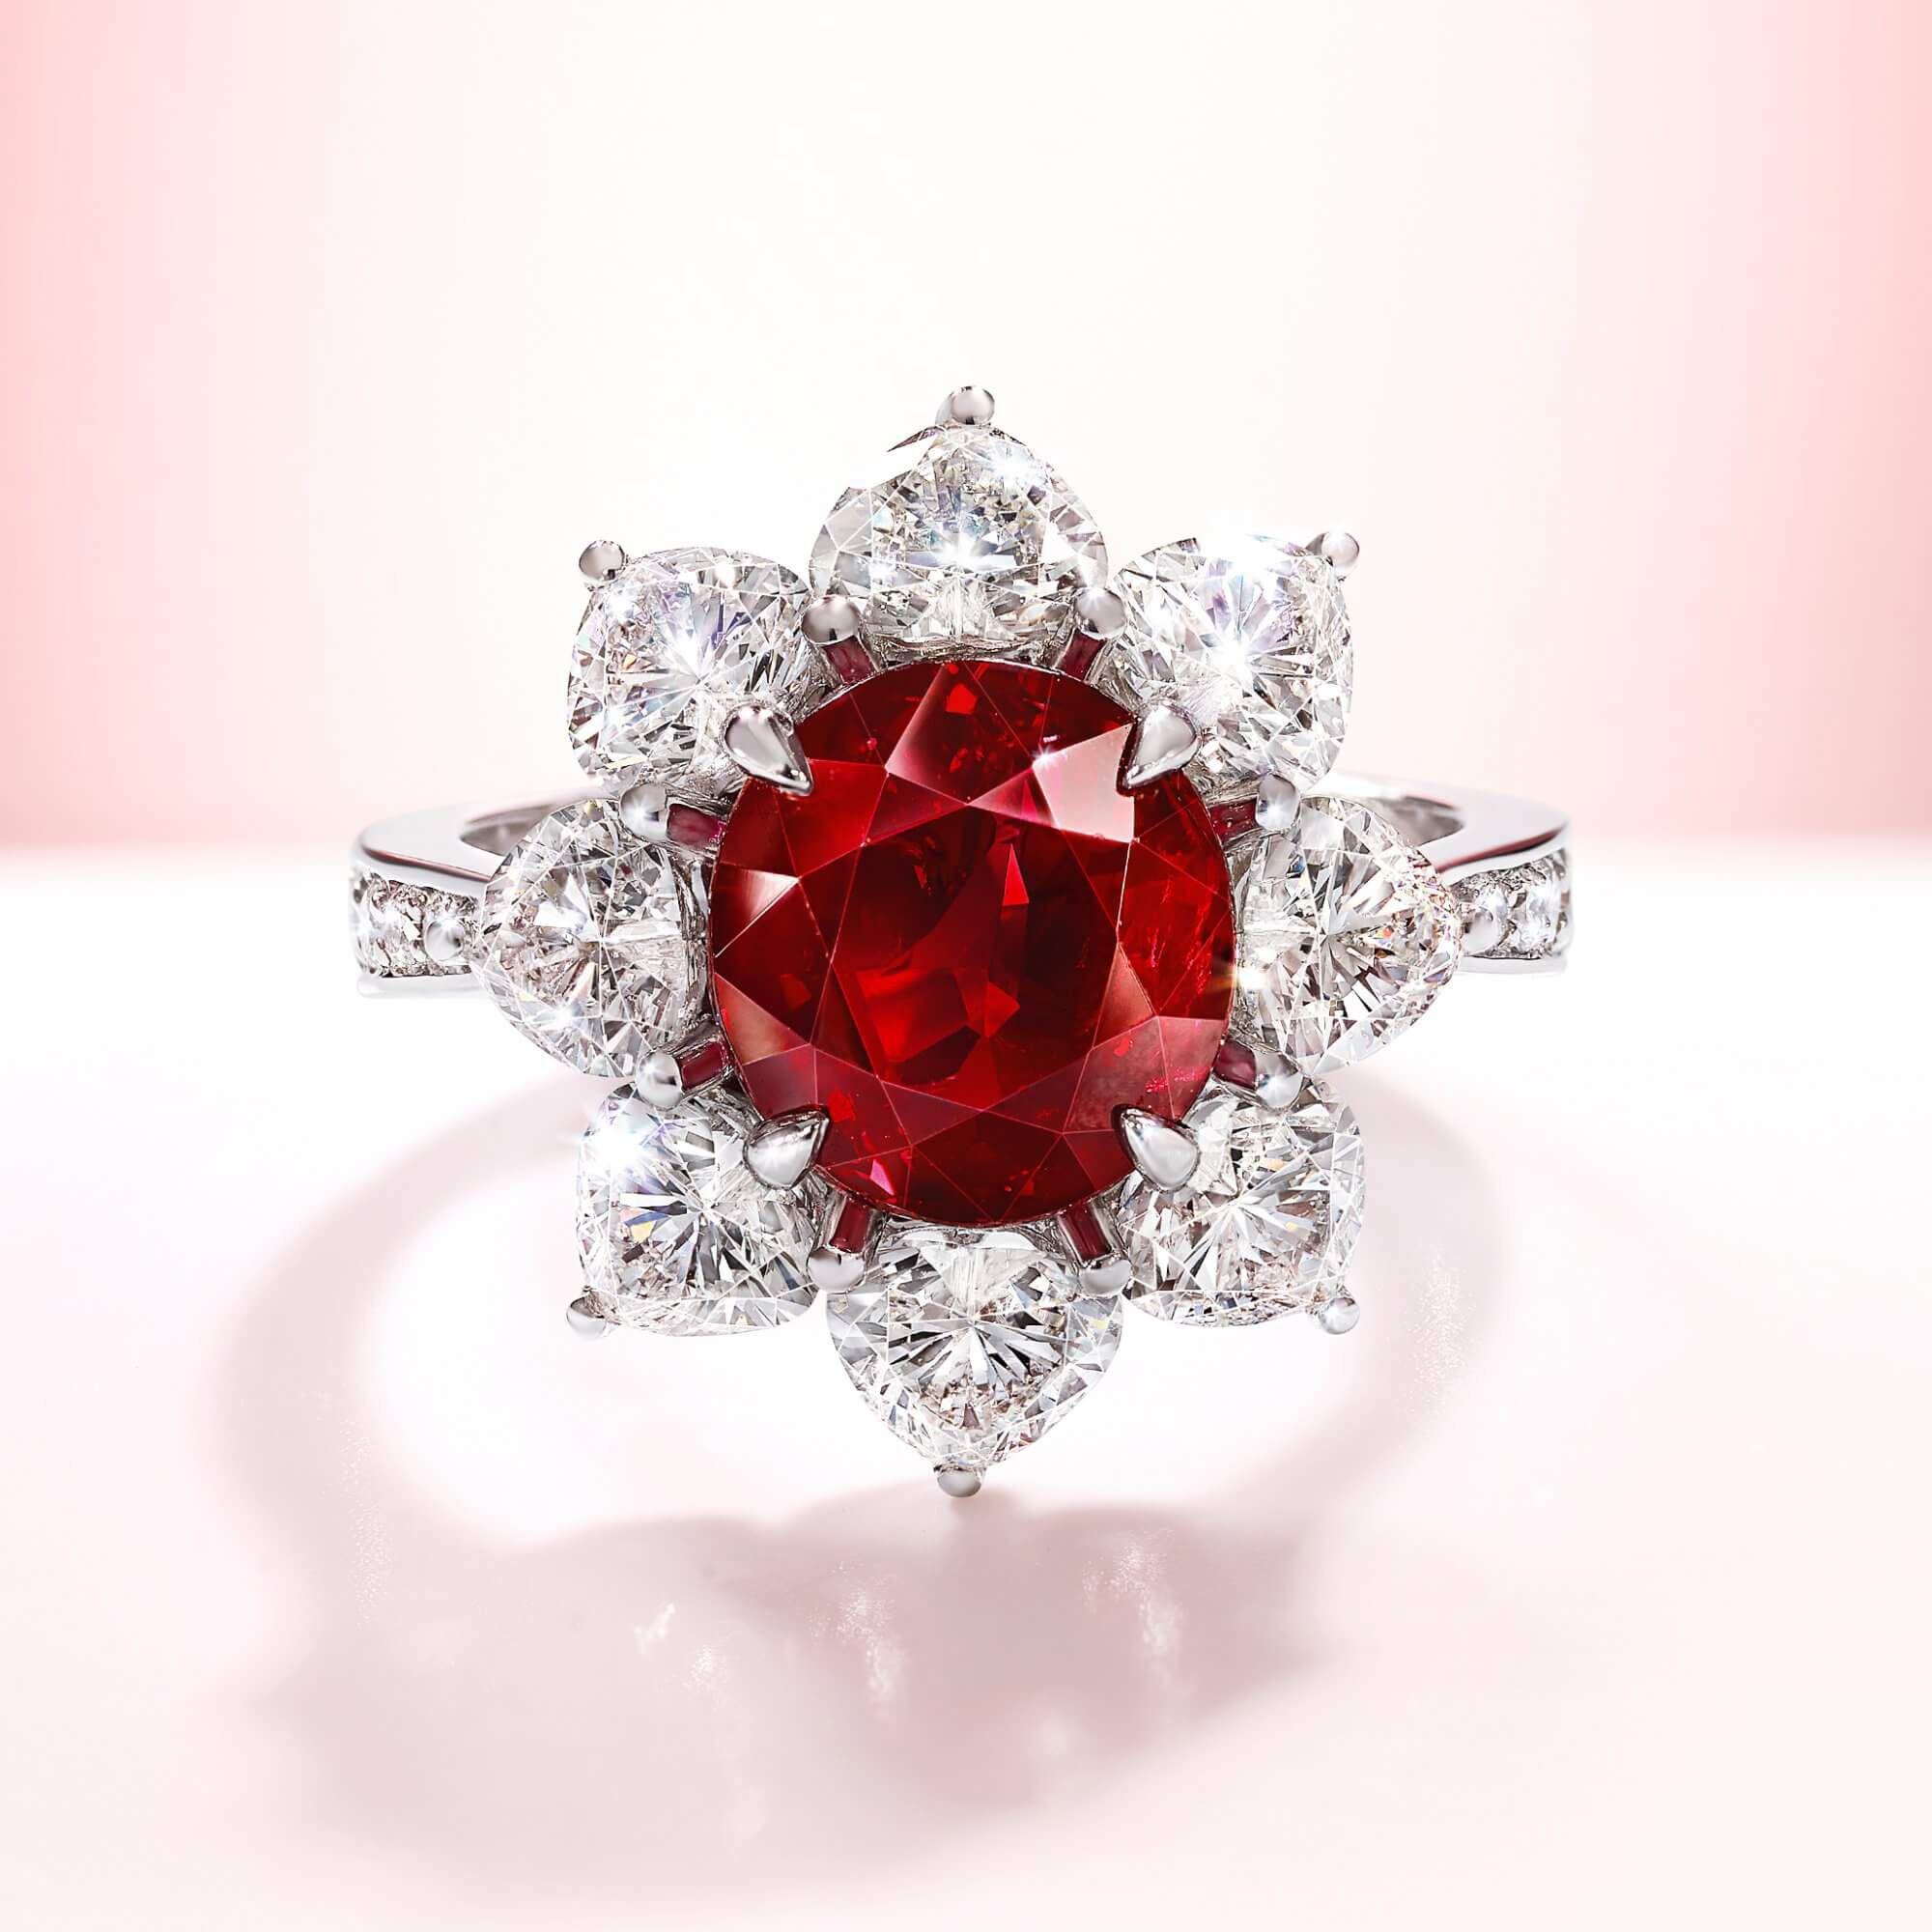 4 ct Oval Burmese Graff Ruby and diamond ring